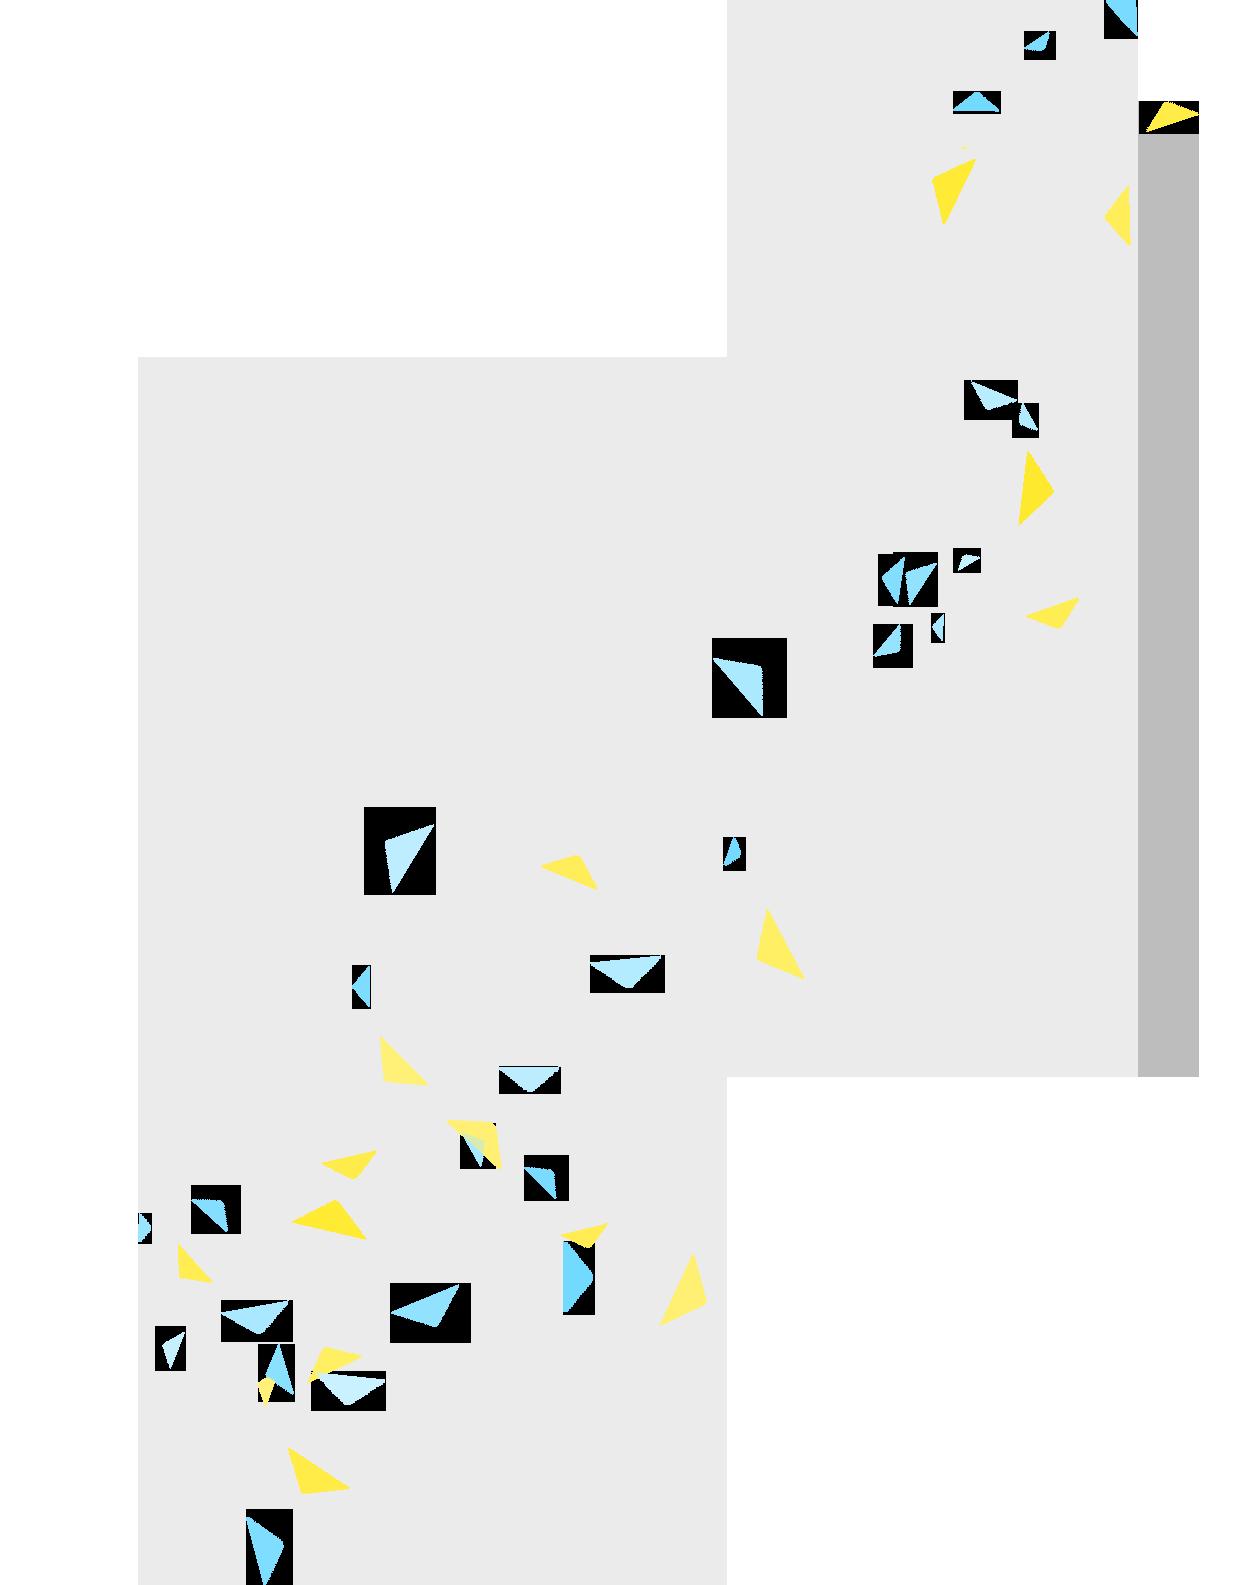 bg-particle